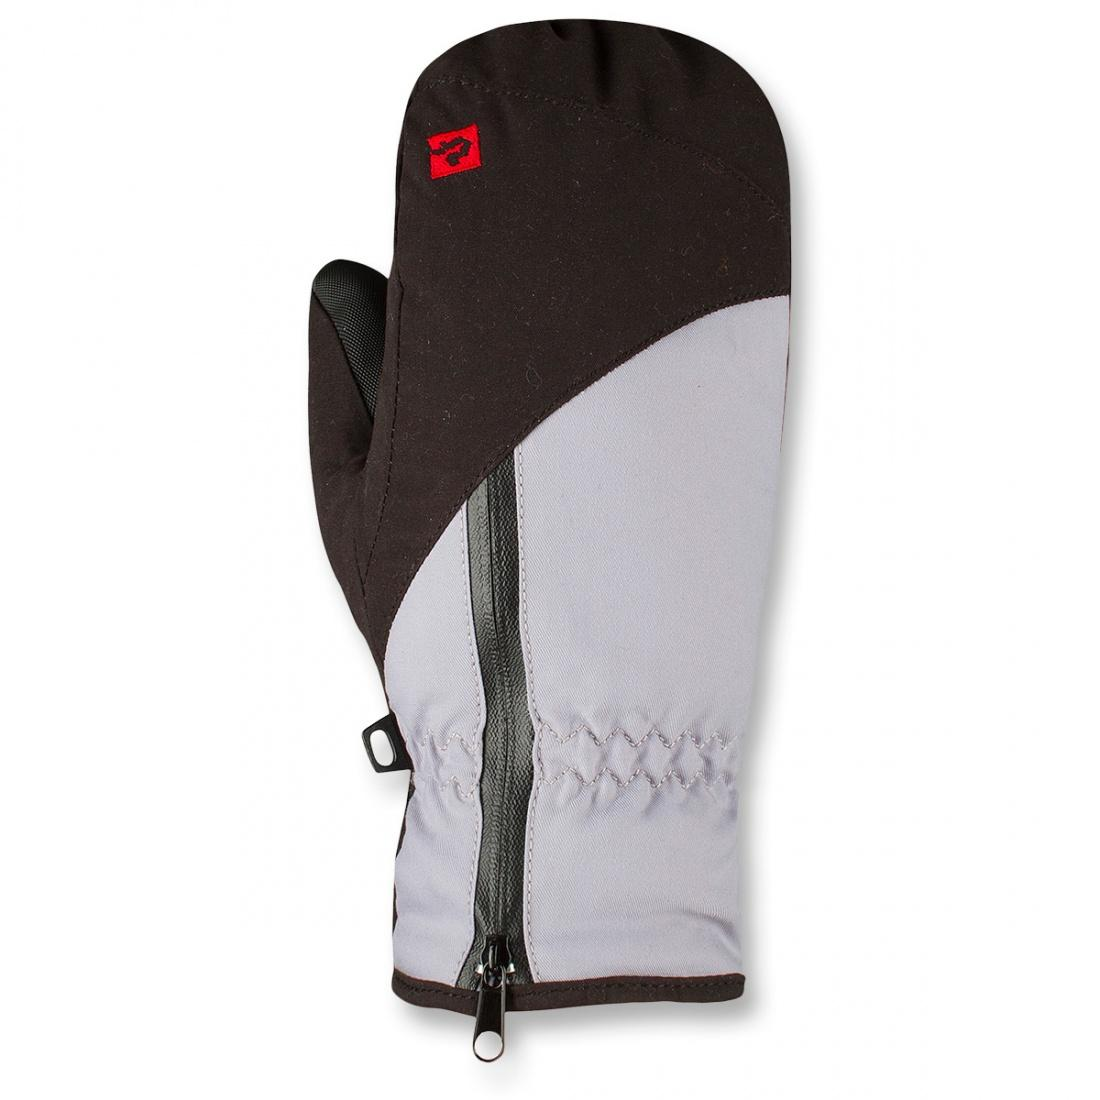 Рукавицы утепленные Traverse II ПодростковыеВарежки<br><br> Прогулочные утепленные рукавицы с ярким дизайном.<br><br><br><br><br><br>Материал – 50% Polyester, 50% Nylon, 156 g/sqm.<br>Усиление – 80% Polyvinyl Chloride, 20% Polyester, 690 g/sqm.<br>Утеплитель – Omnitherm® Classic...<br><br>Цвет: Бежевый<br>Размер: XL